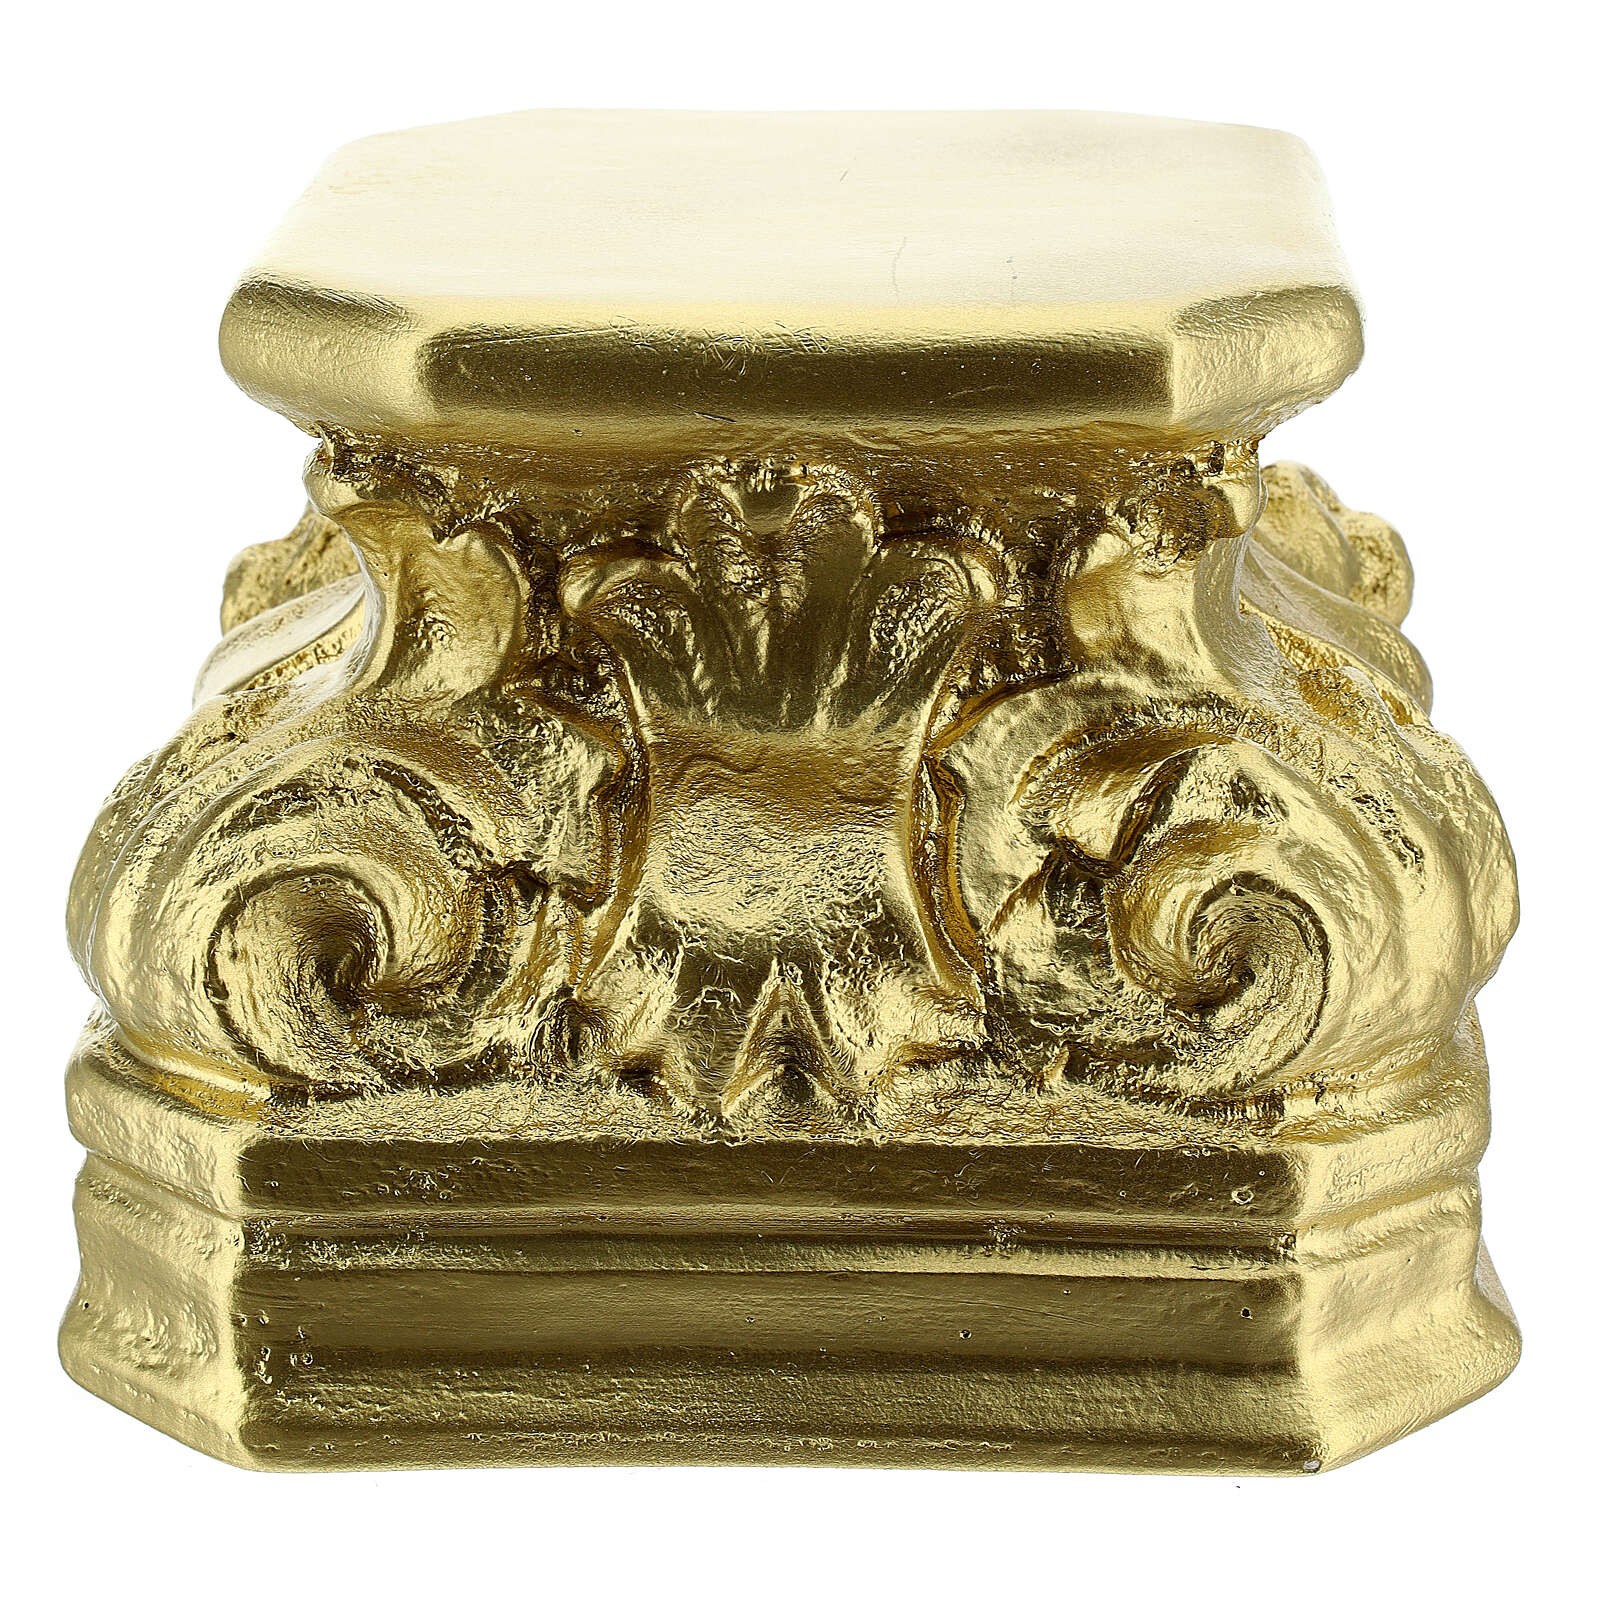 Golden plaster statue base 5 1/2x5 1/2x5 1/2 in Arte Barsanti 4